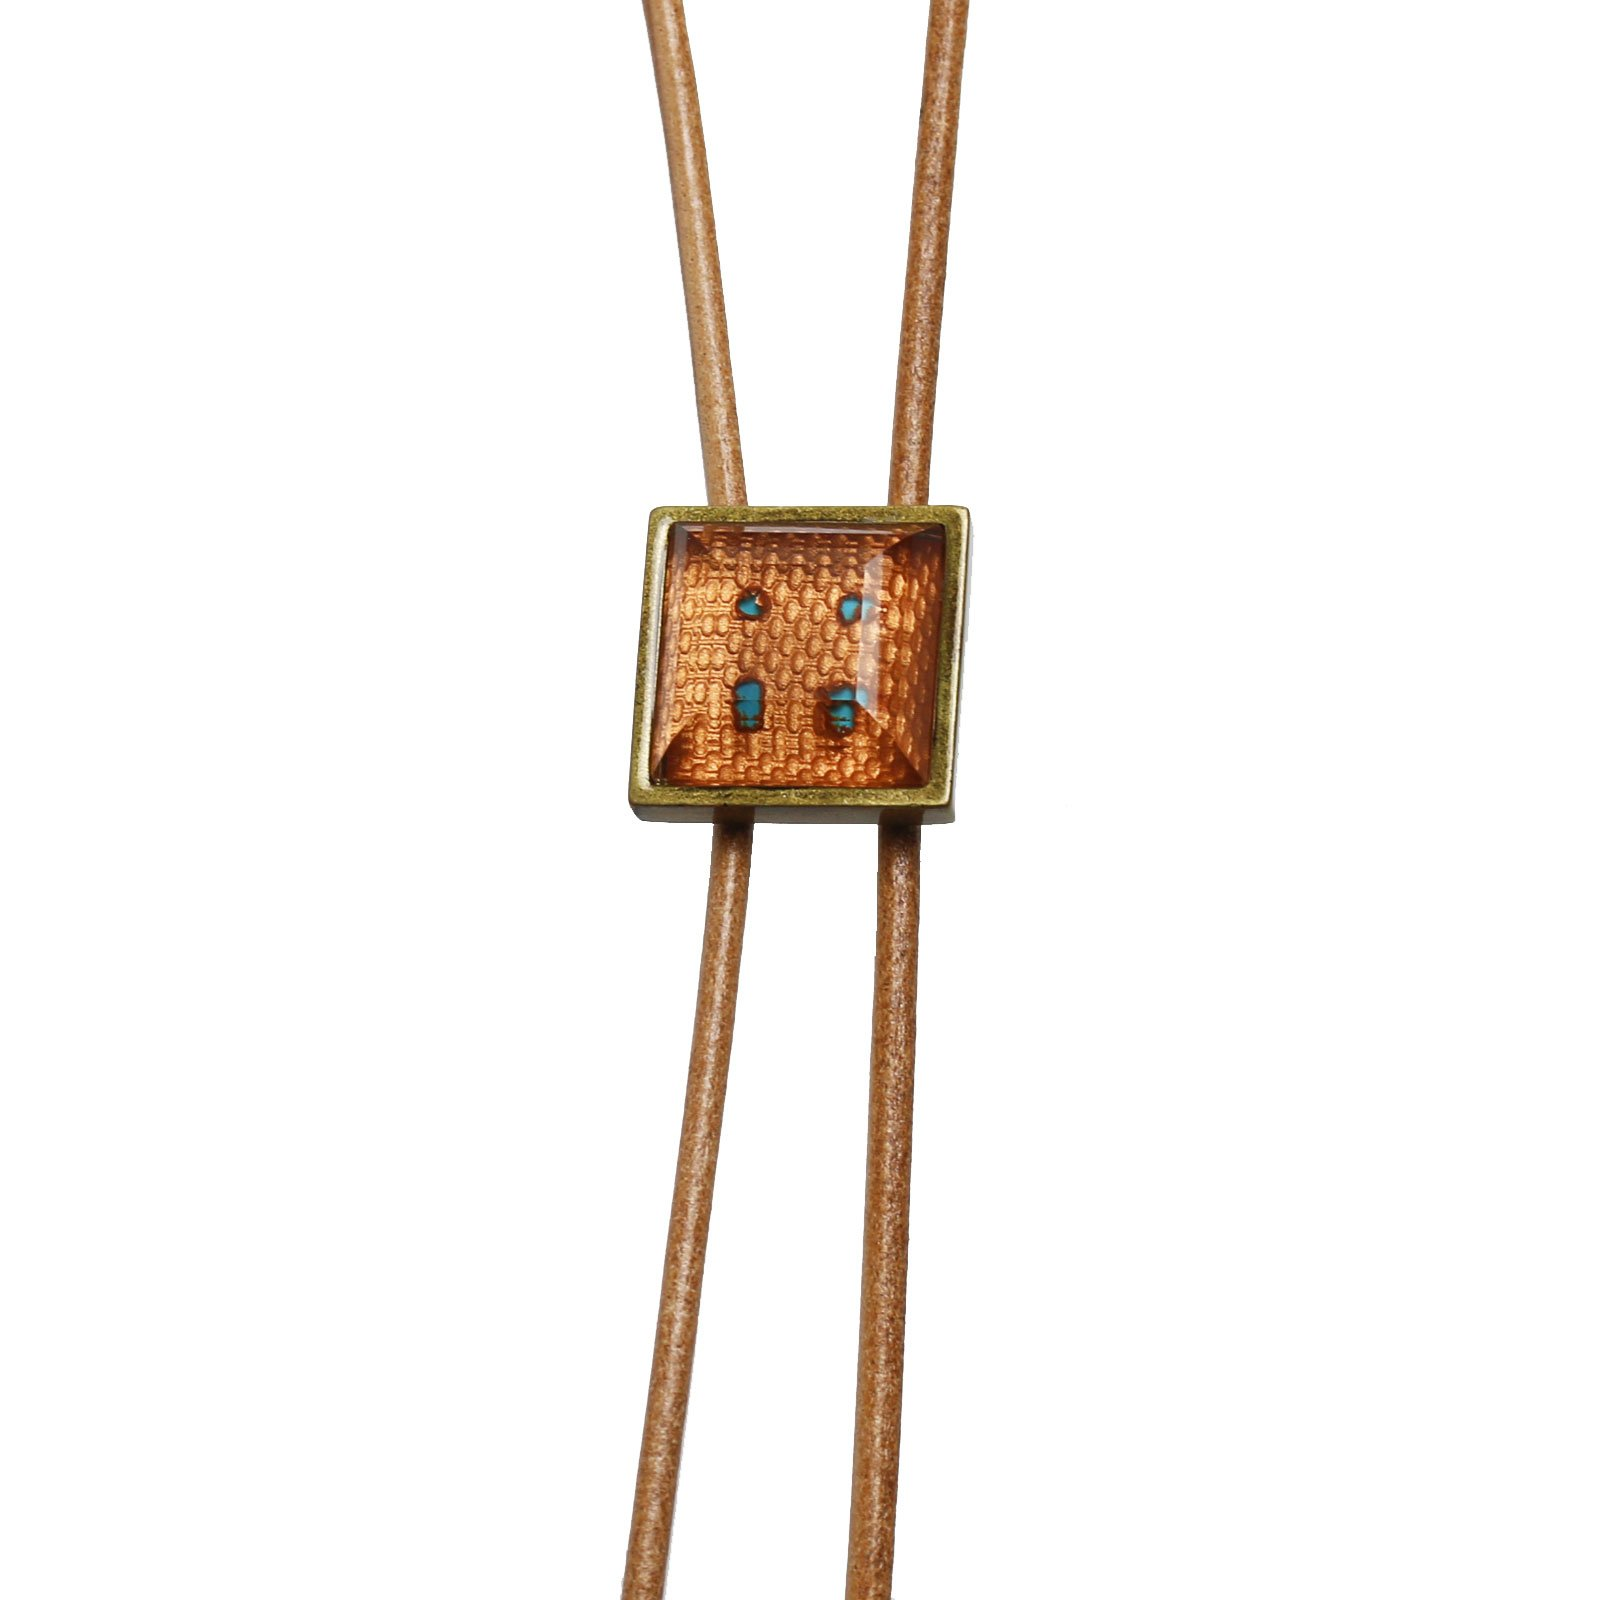 Tamarusan Bolo Tie Handmade Men'S Accessories Orange Leather Necktie